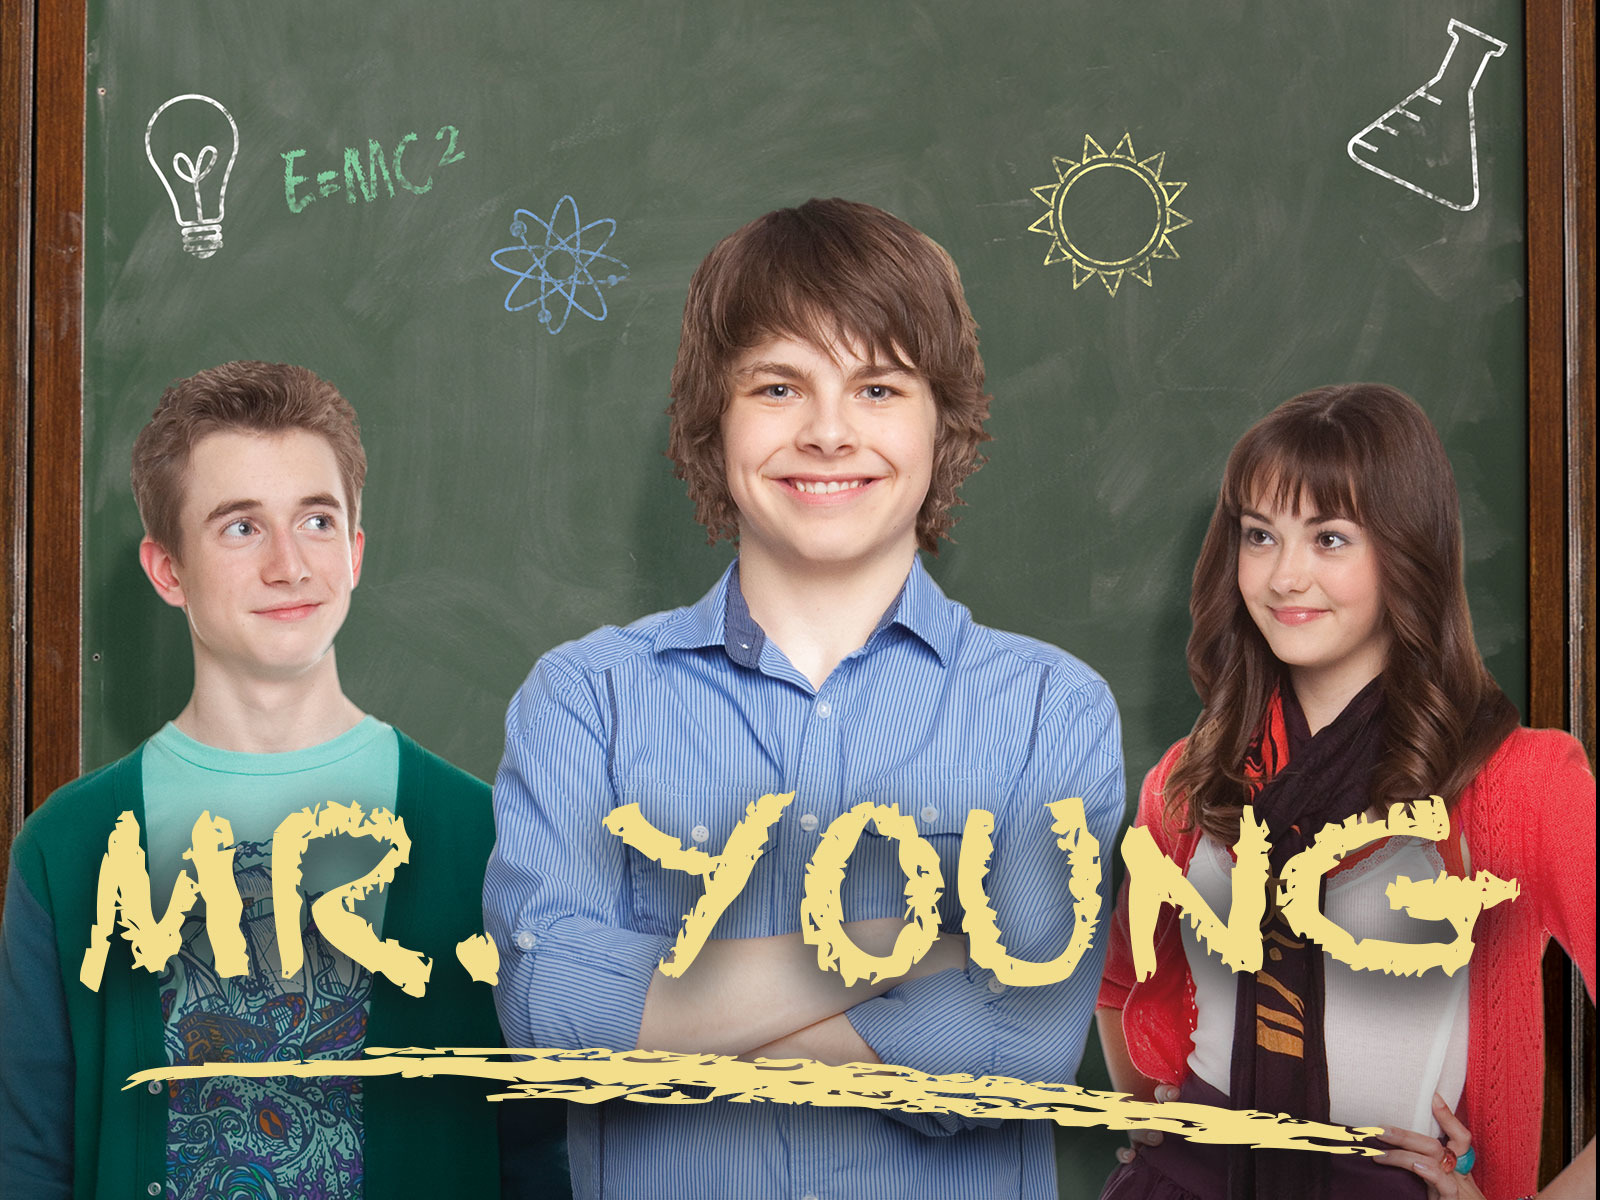 Mr. Young (TV Series 2011-2013) - Full Cast & Crew - IMDb